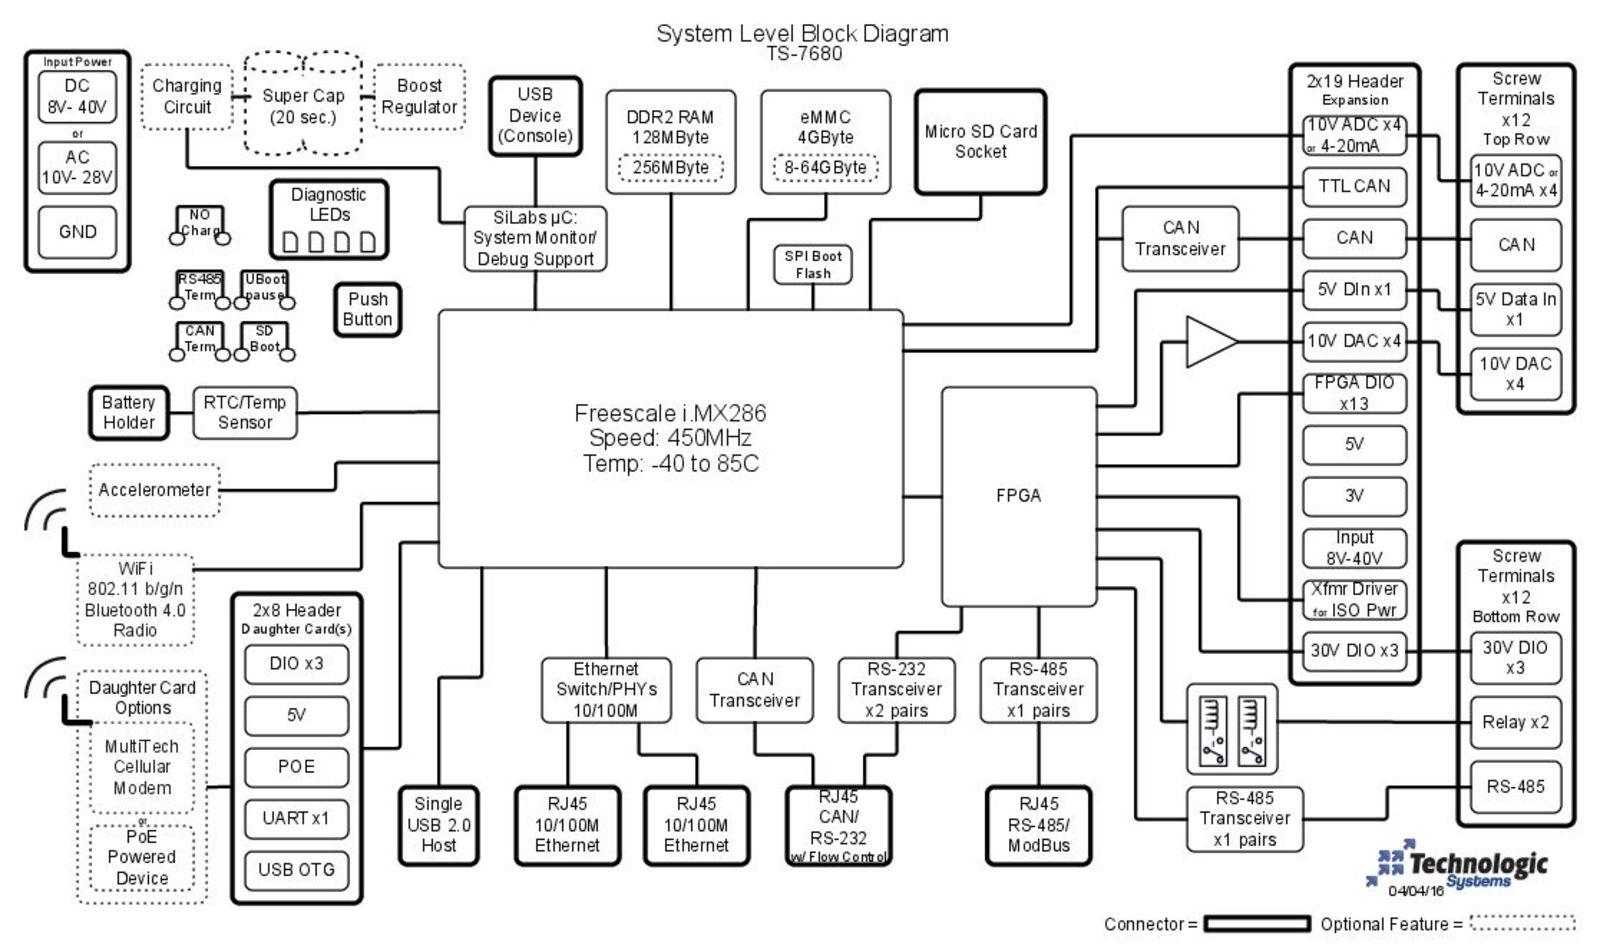 TS-7680 Block Diagram Image